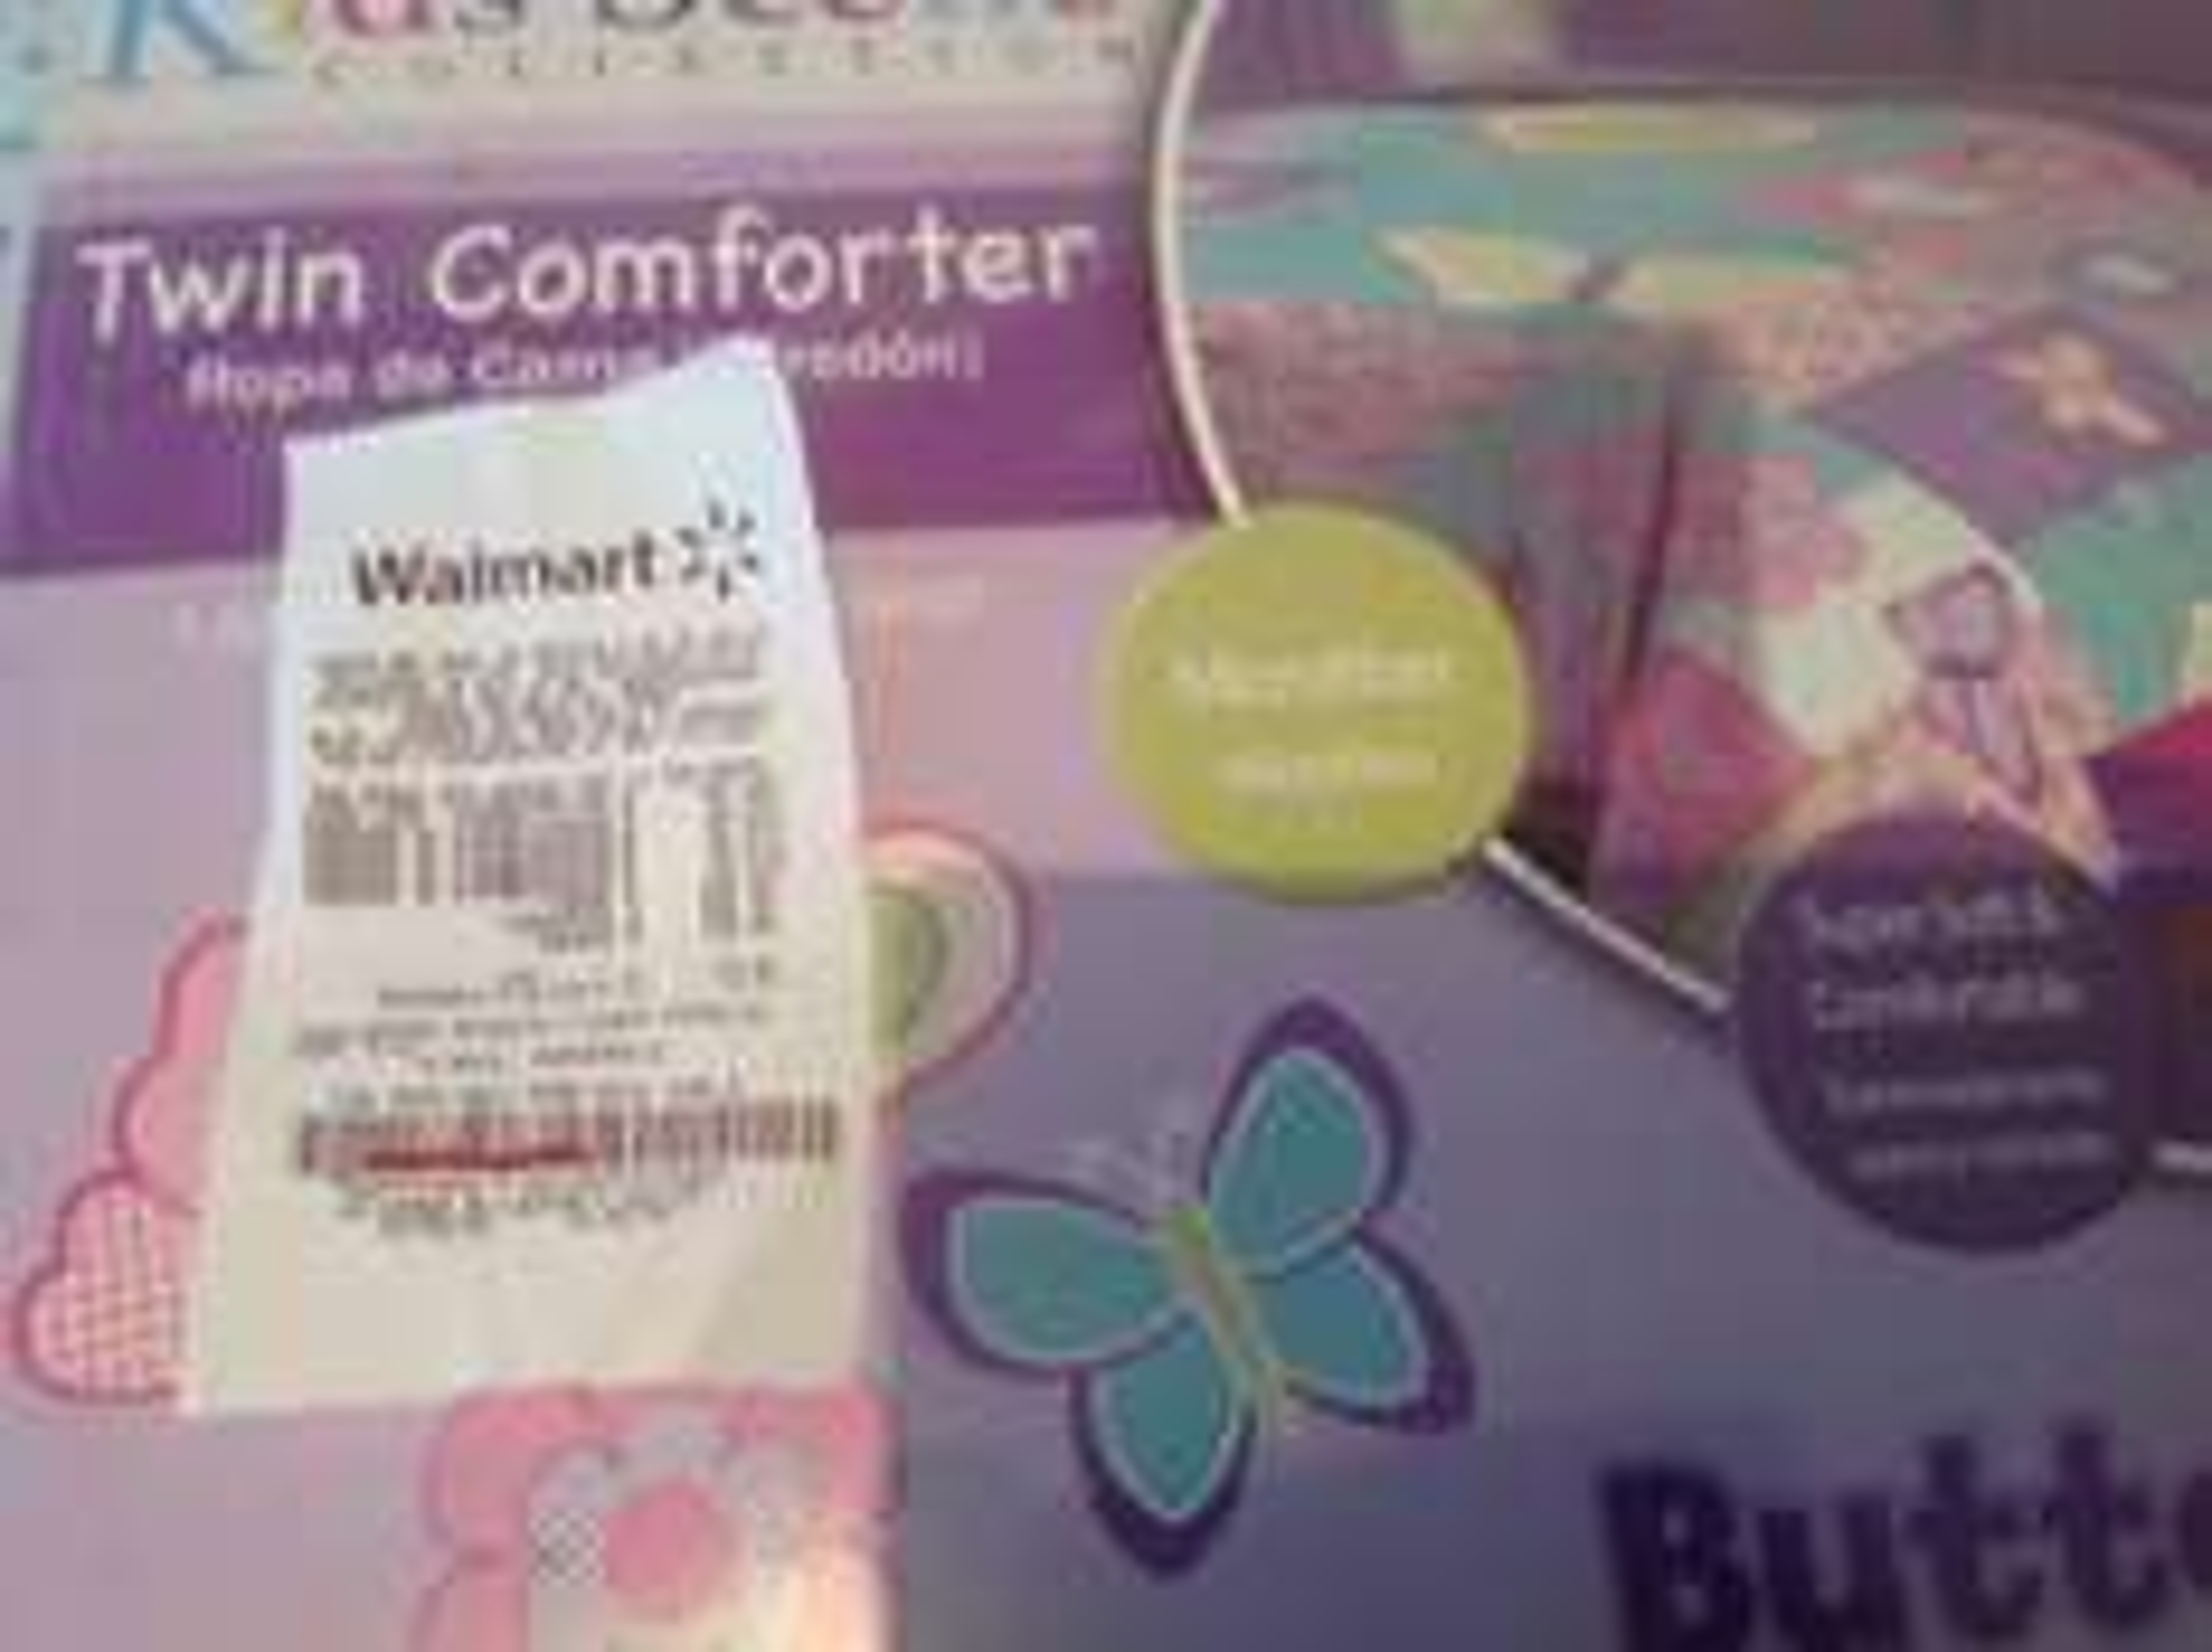 Walmart alfredo del mazo y terminal TOLUCA: Edredones a $50.01